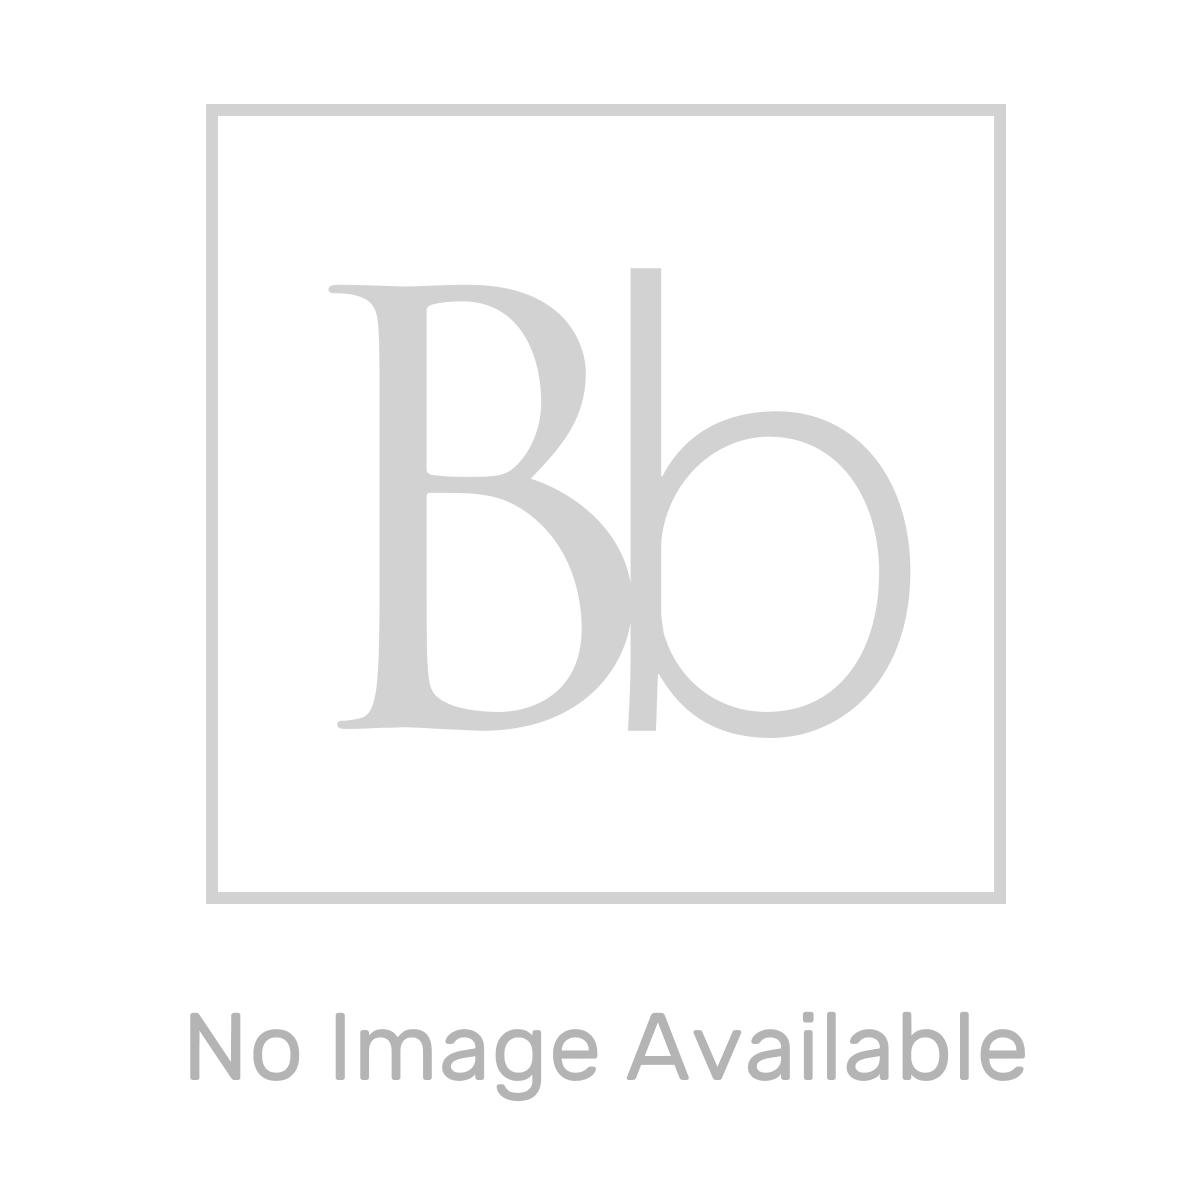 BTL Amyris with Morina White Gloss Furniture